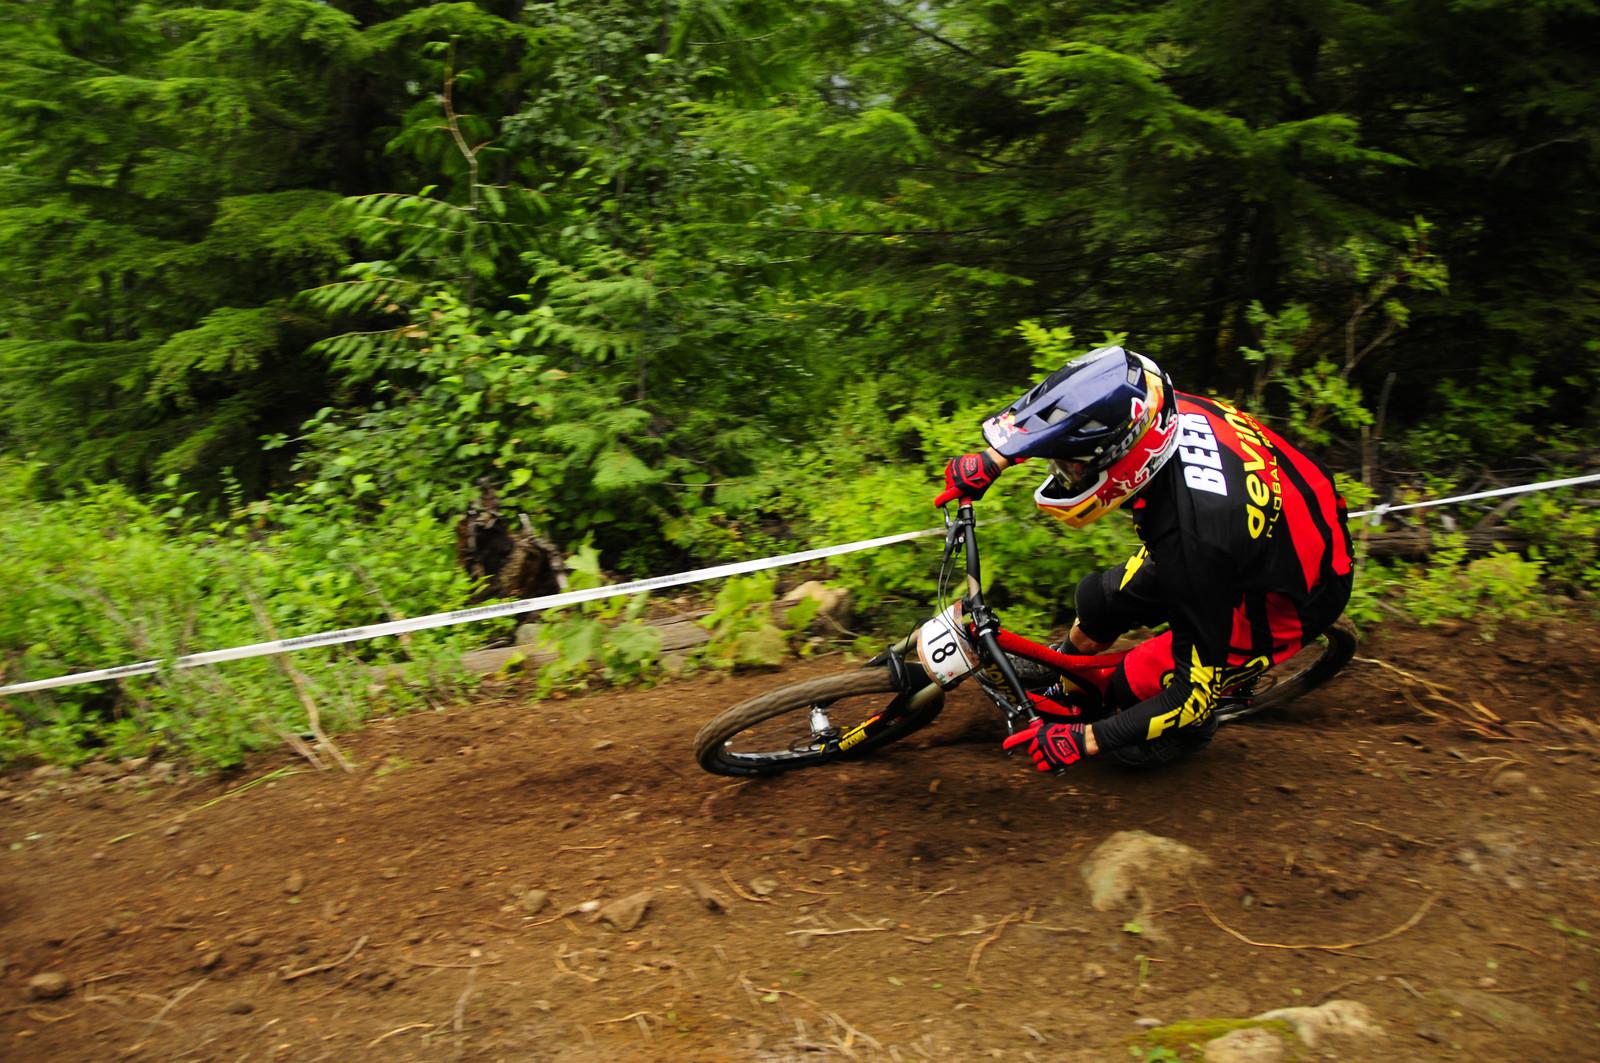 Canadian Open Steavee - ezefaccio - Mountain Biking Pictures - Vital MTB